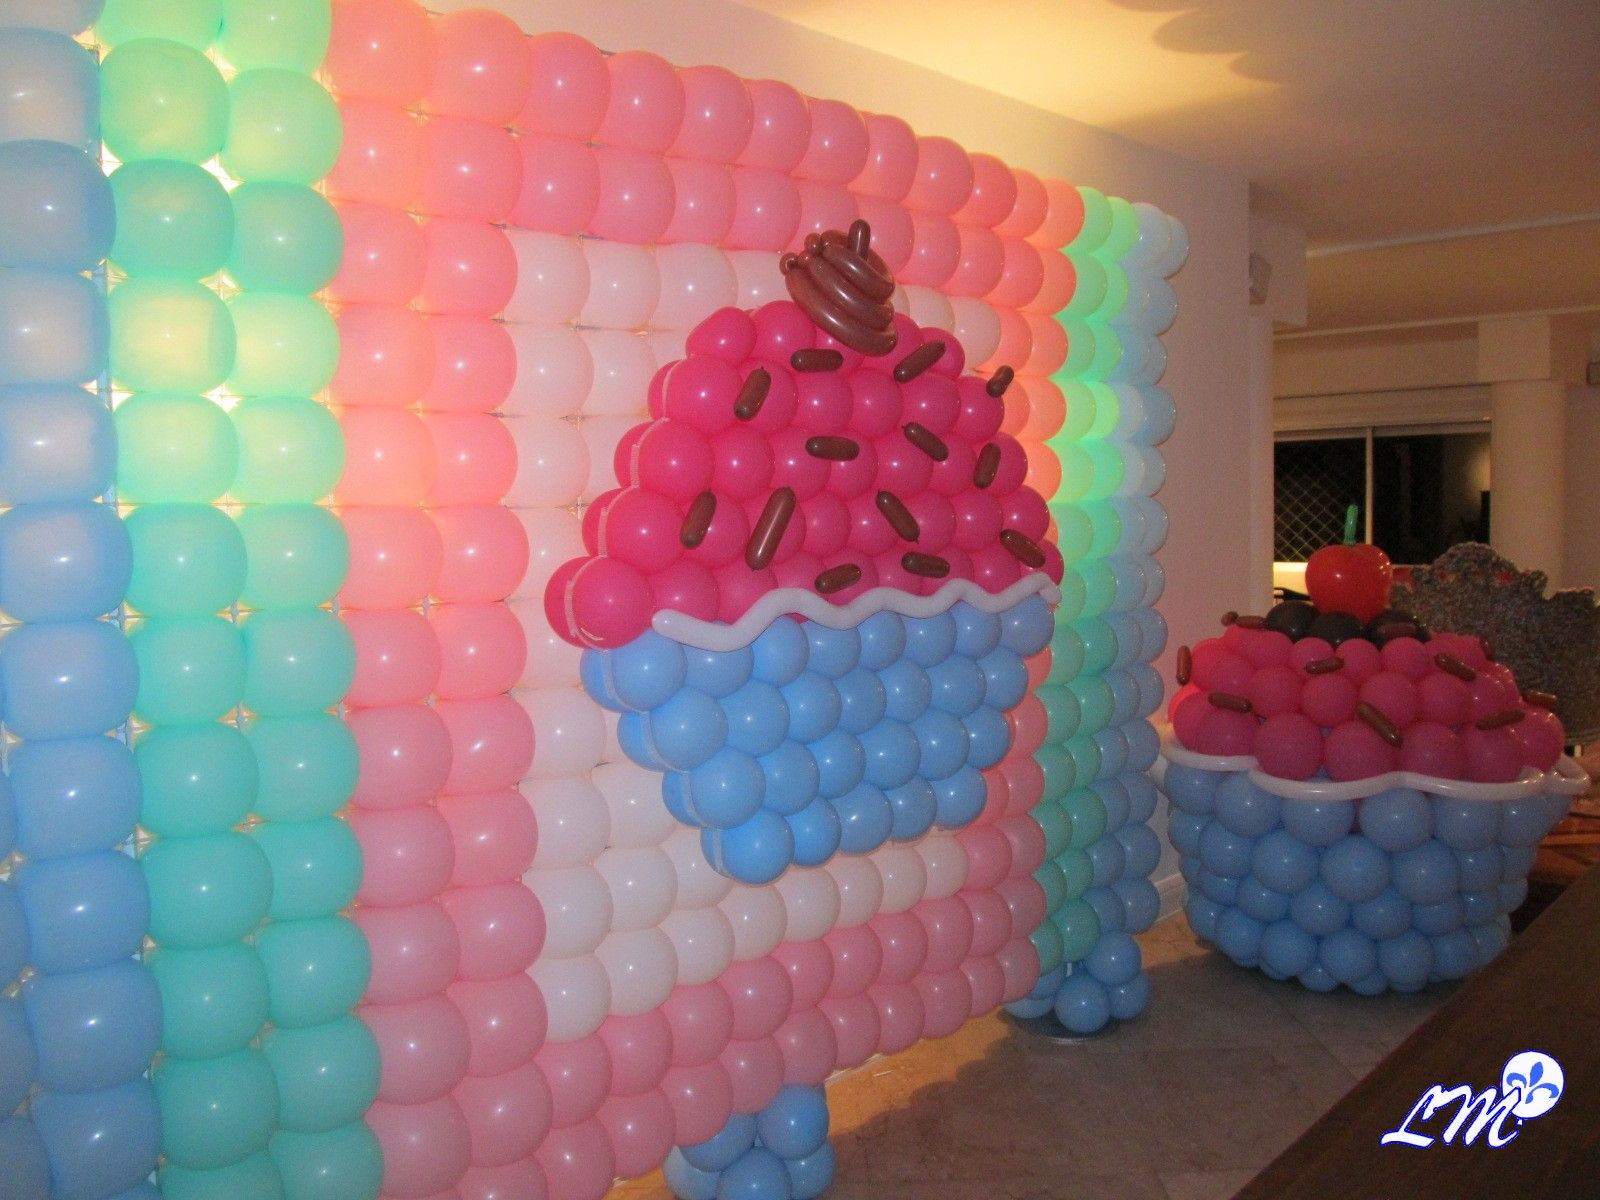 Decoracao Cupcake Painel Baloes Pds Escultura Curitiba Provencal